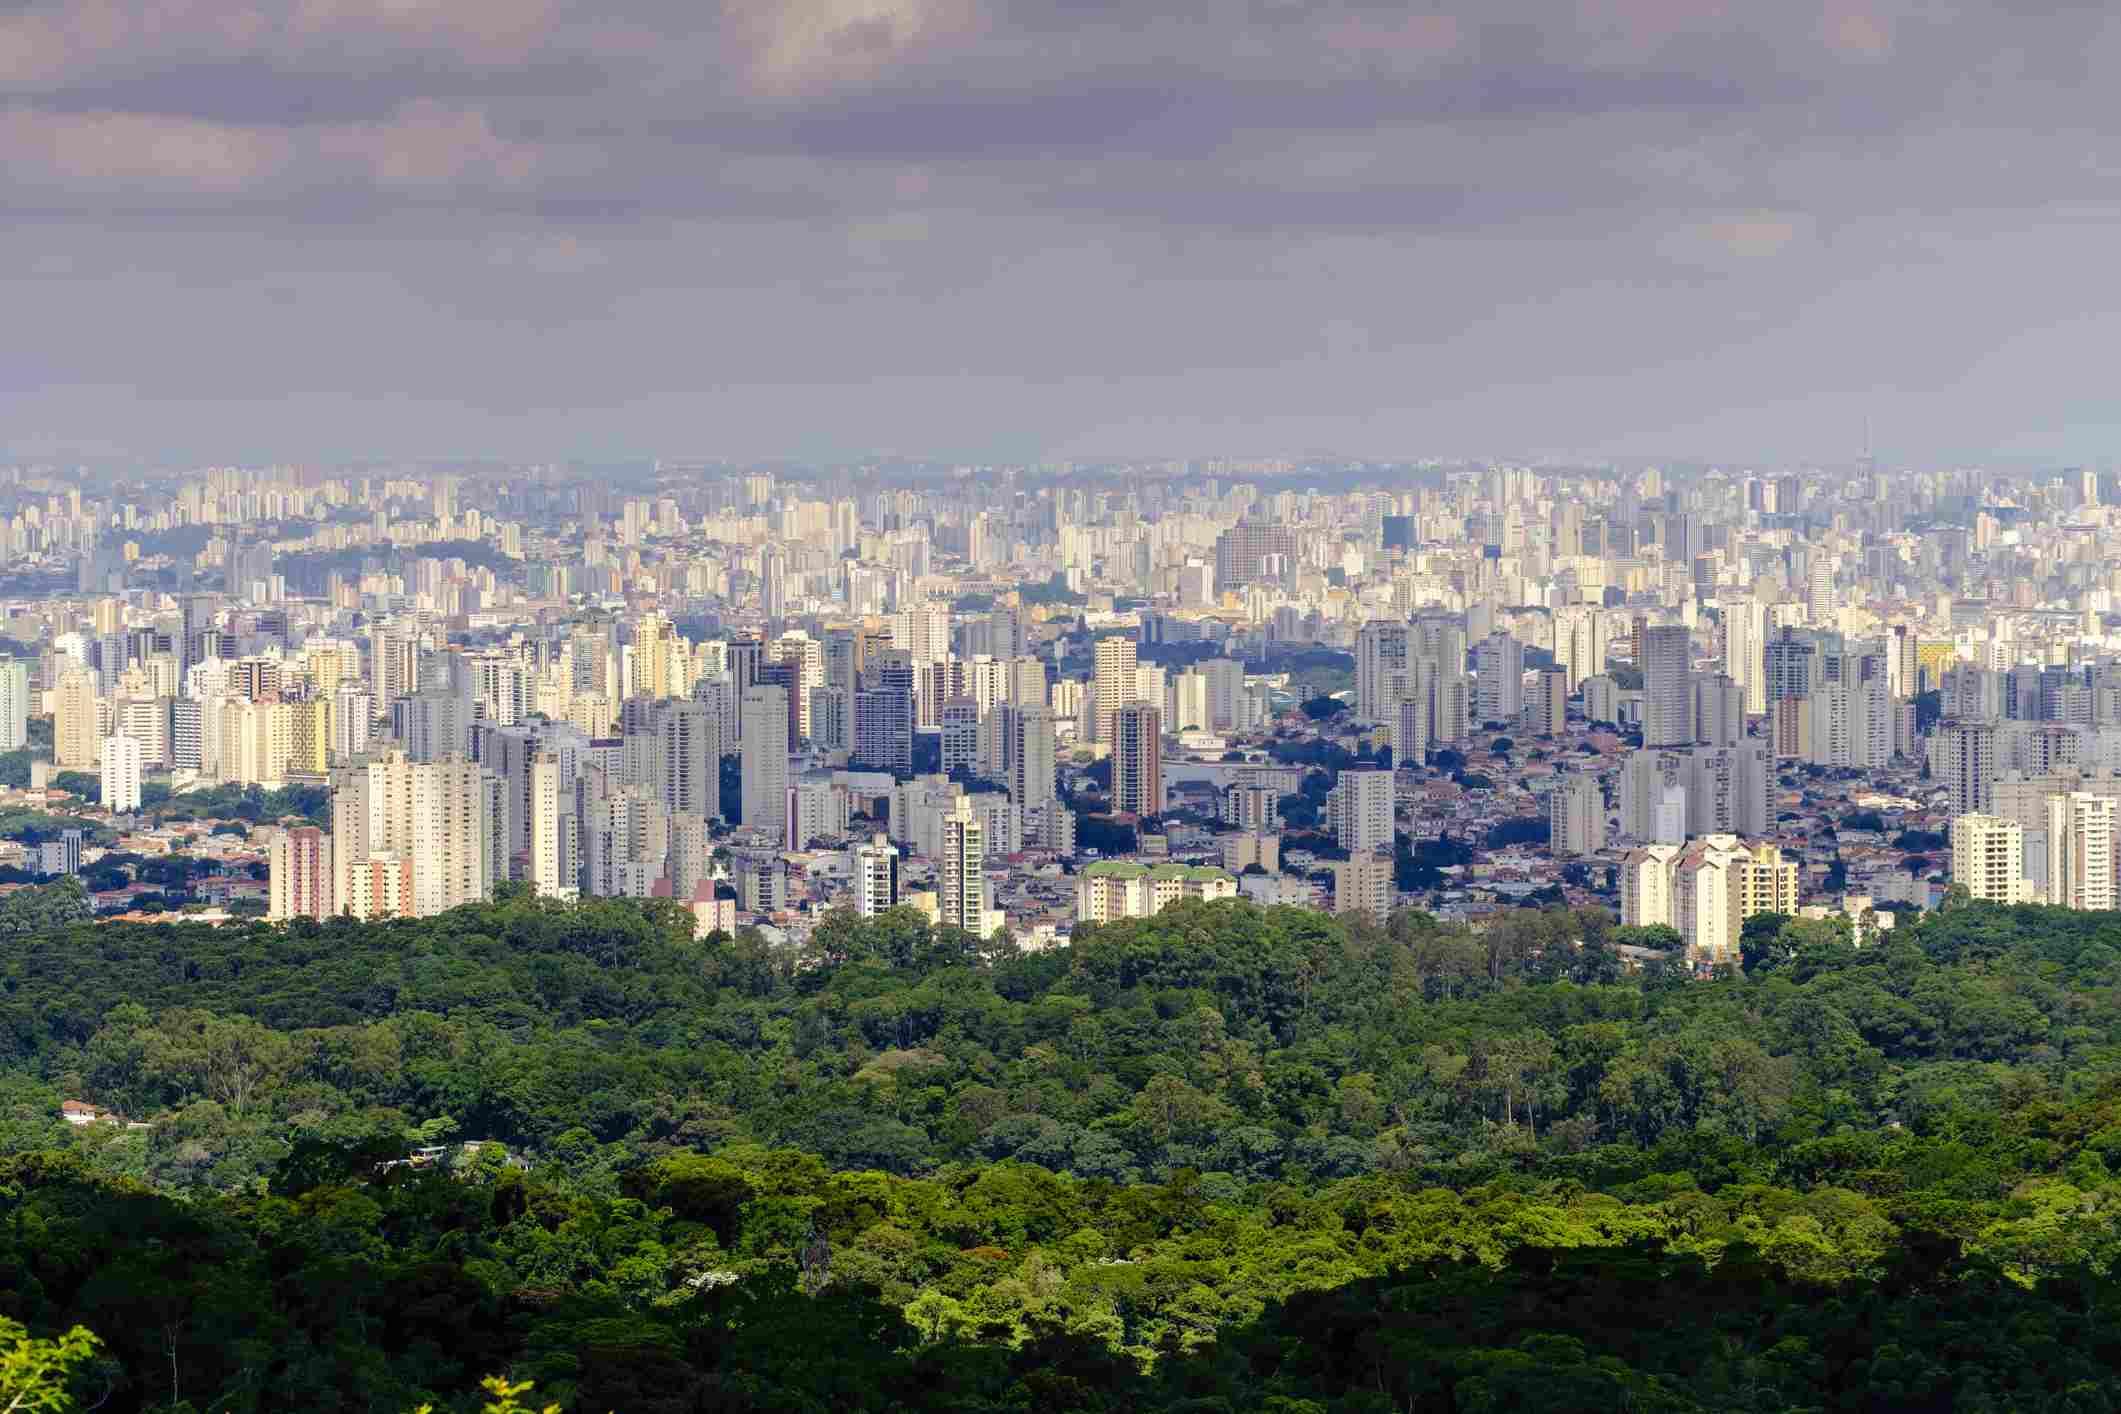 Sao Paulo from the Serra da Cantareira state park